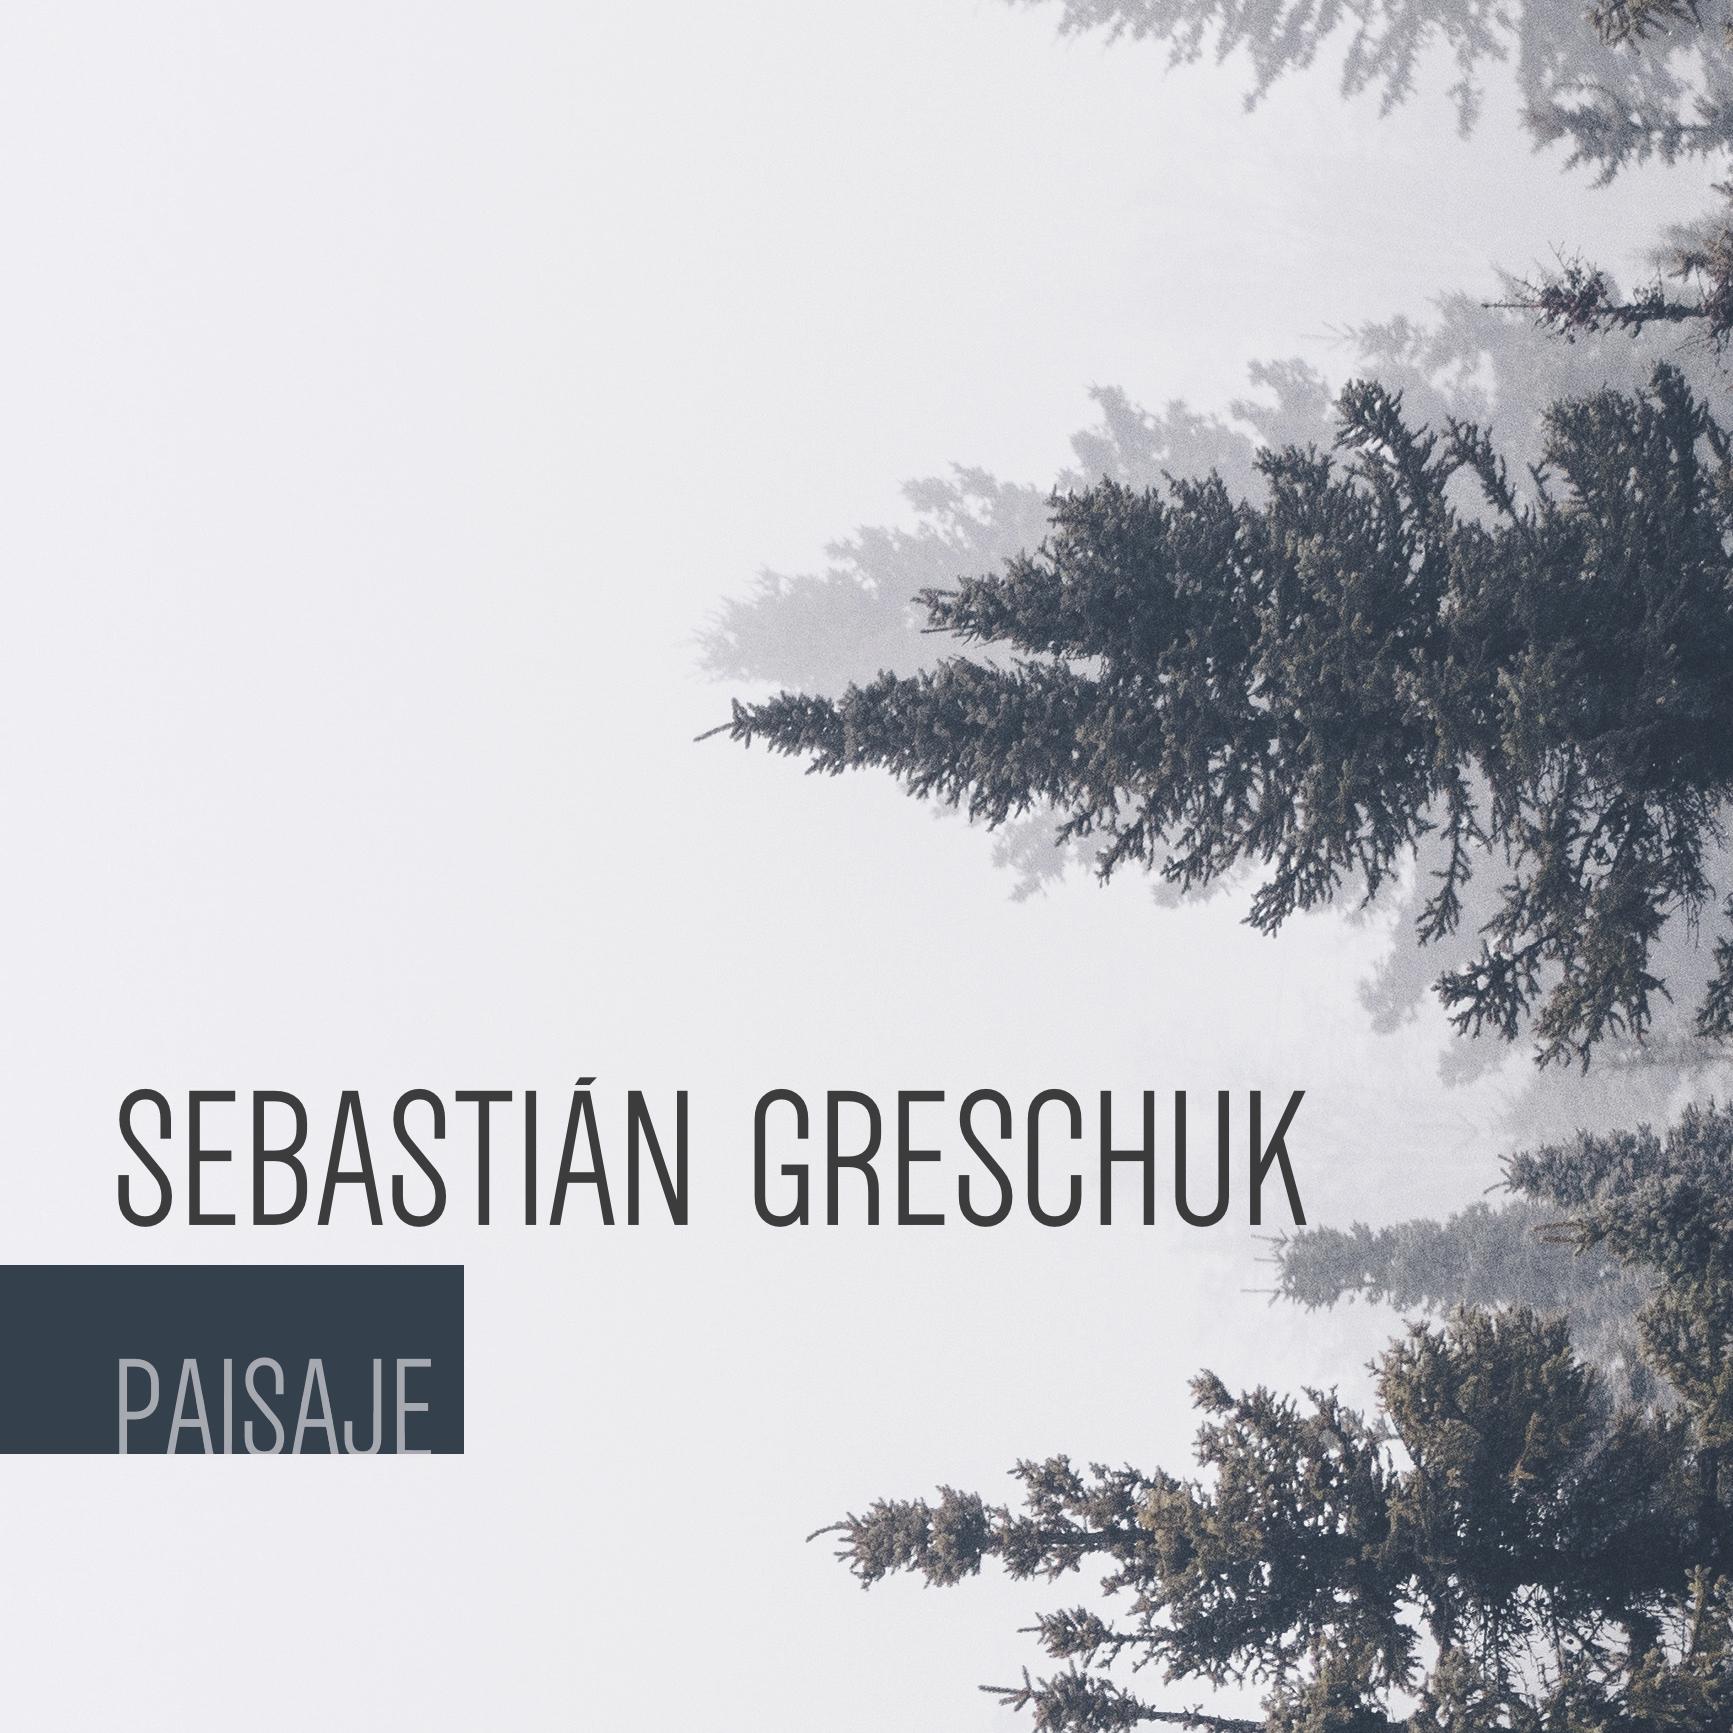 Sebastian Greschuk | Paisaje